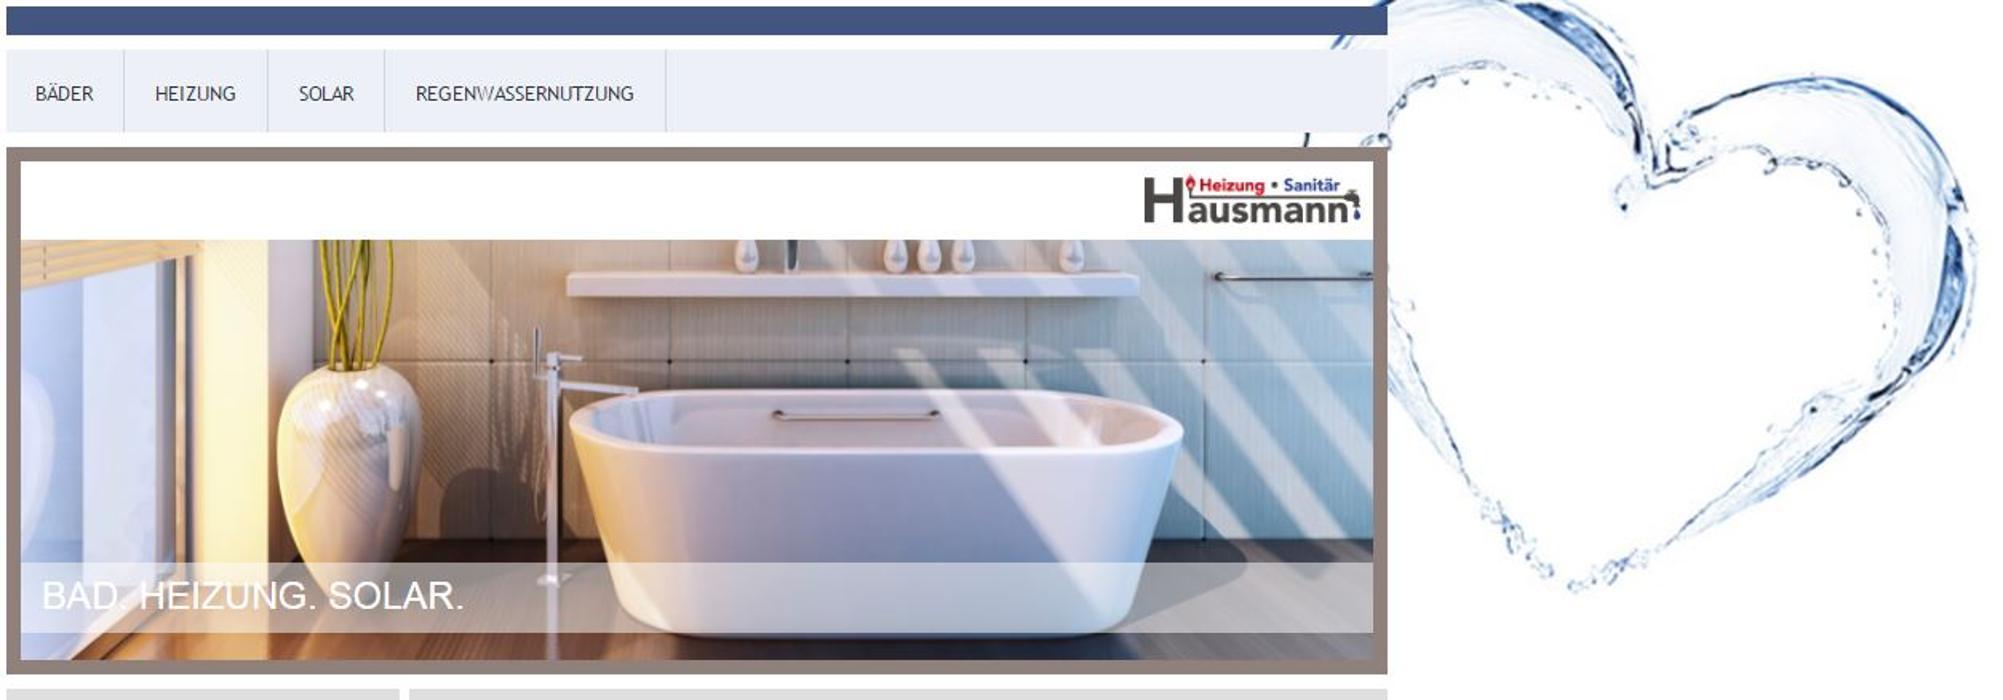 hausmann heizung und sanit r hauptstra e in 91785. Black Bedroom Furniture Sets. Home Design Ideas